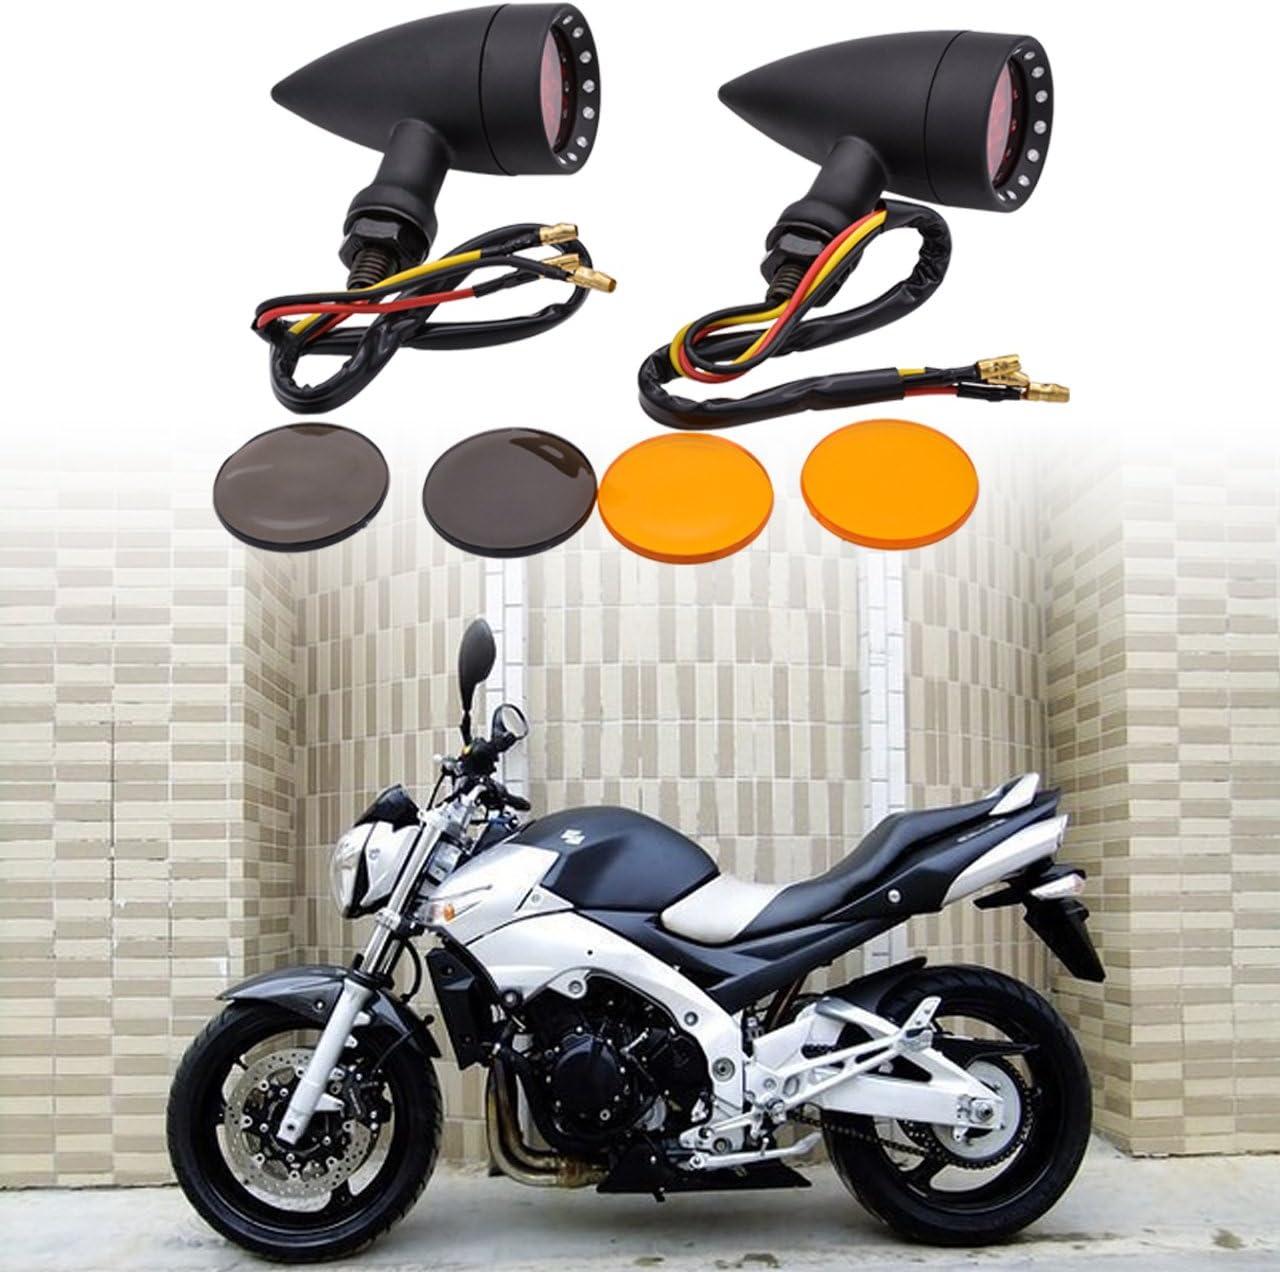 perfk 2pcs CNC Aluminium Alloy Height Extender Shock Absorber Motorbike Jack Up Riser Suspension 77mm Black